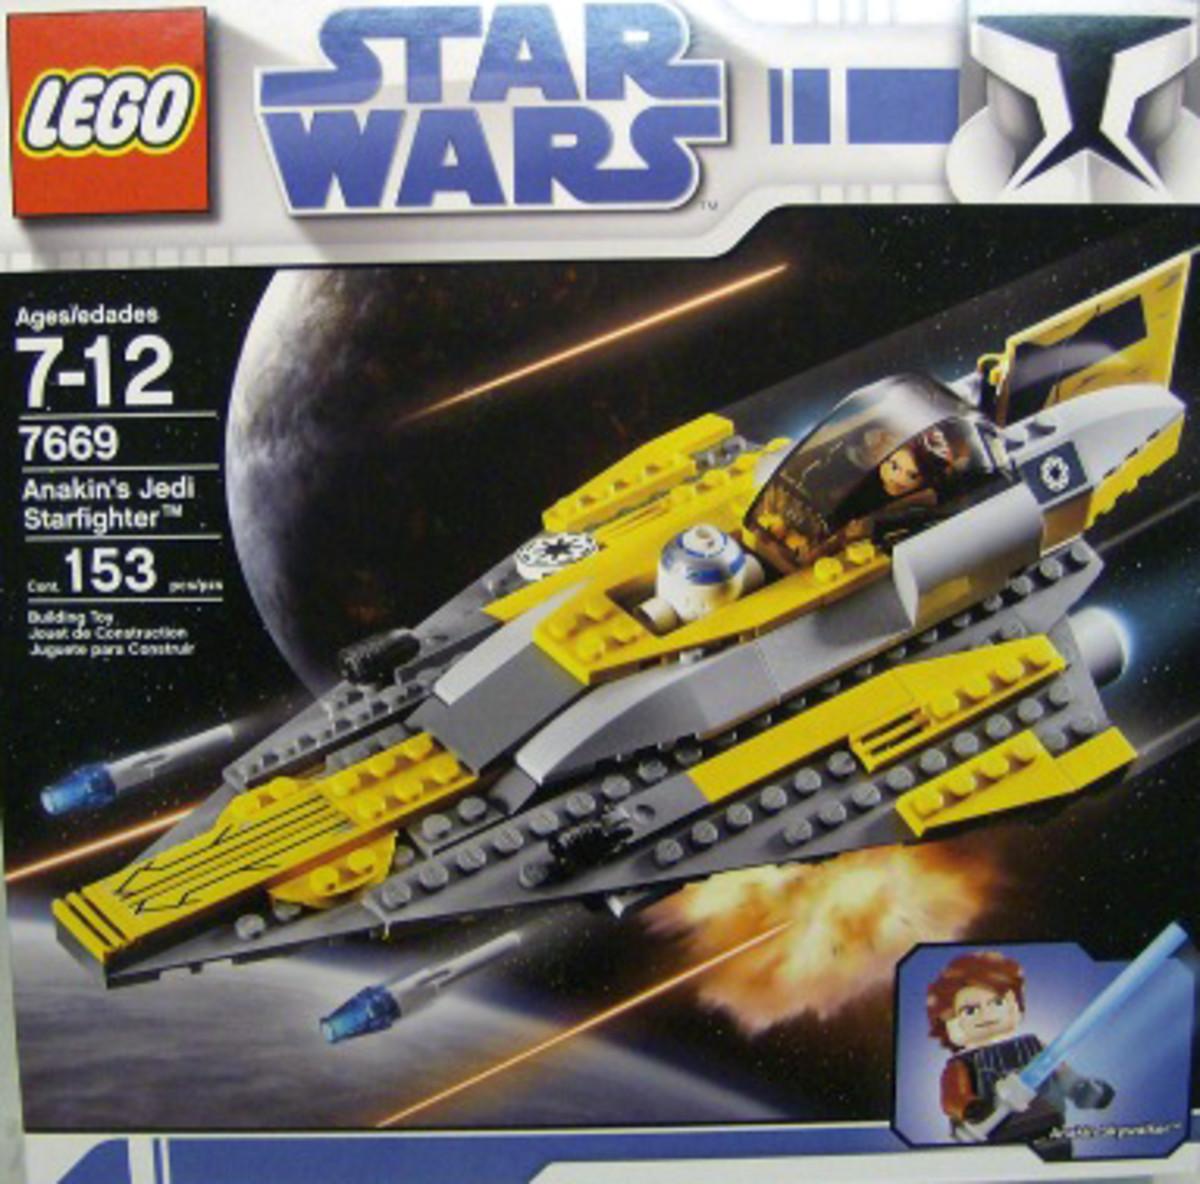 LEGO Star Wars Anakin's Jedi Starfighter 7669 Box